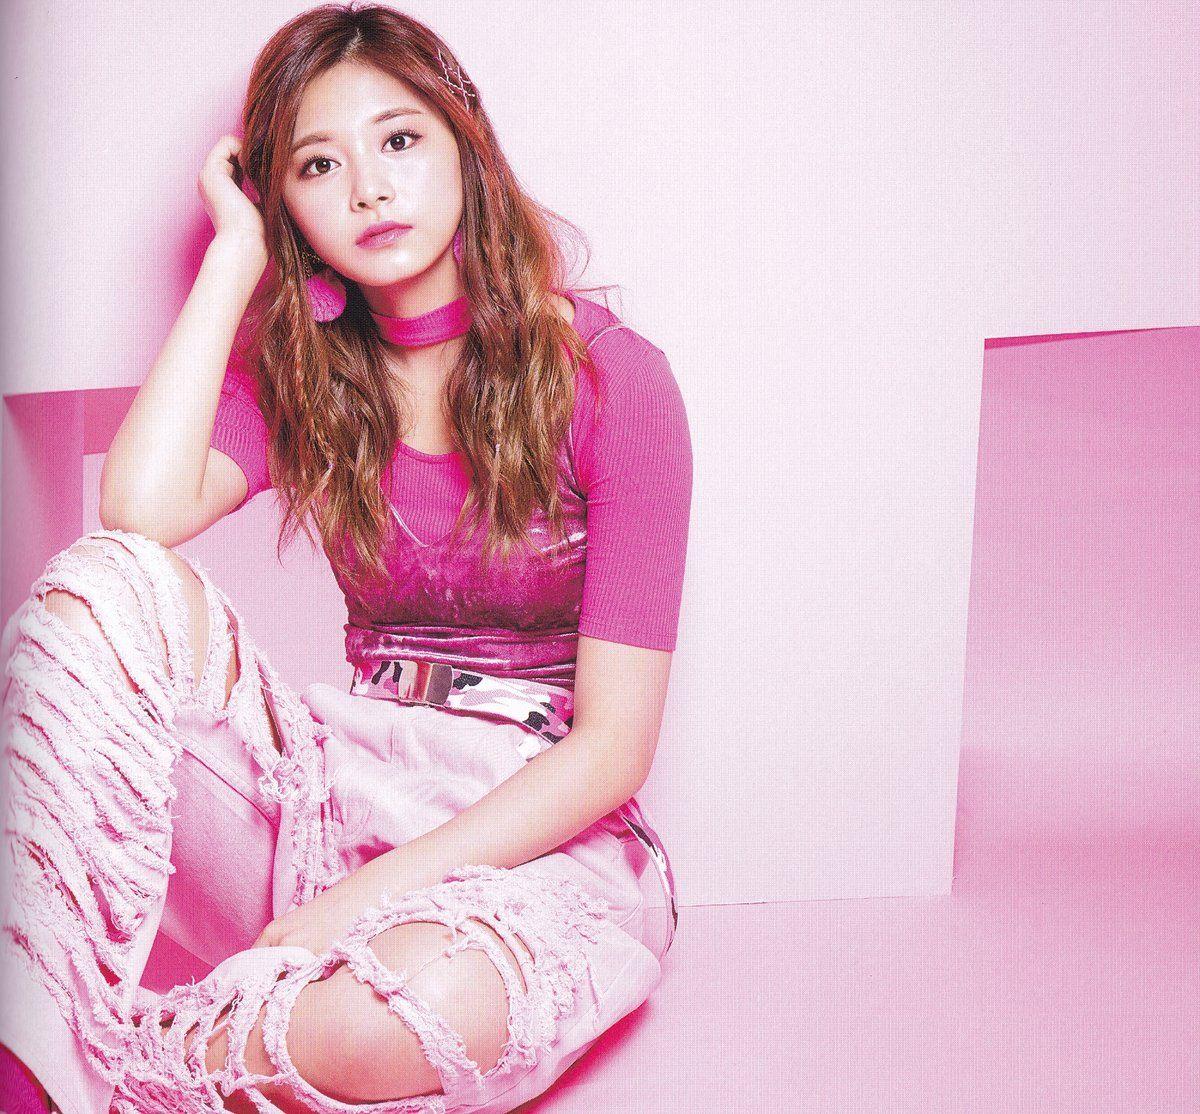 Kpop Girls, Tzuyu Twice, Most Beautiful Faces